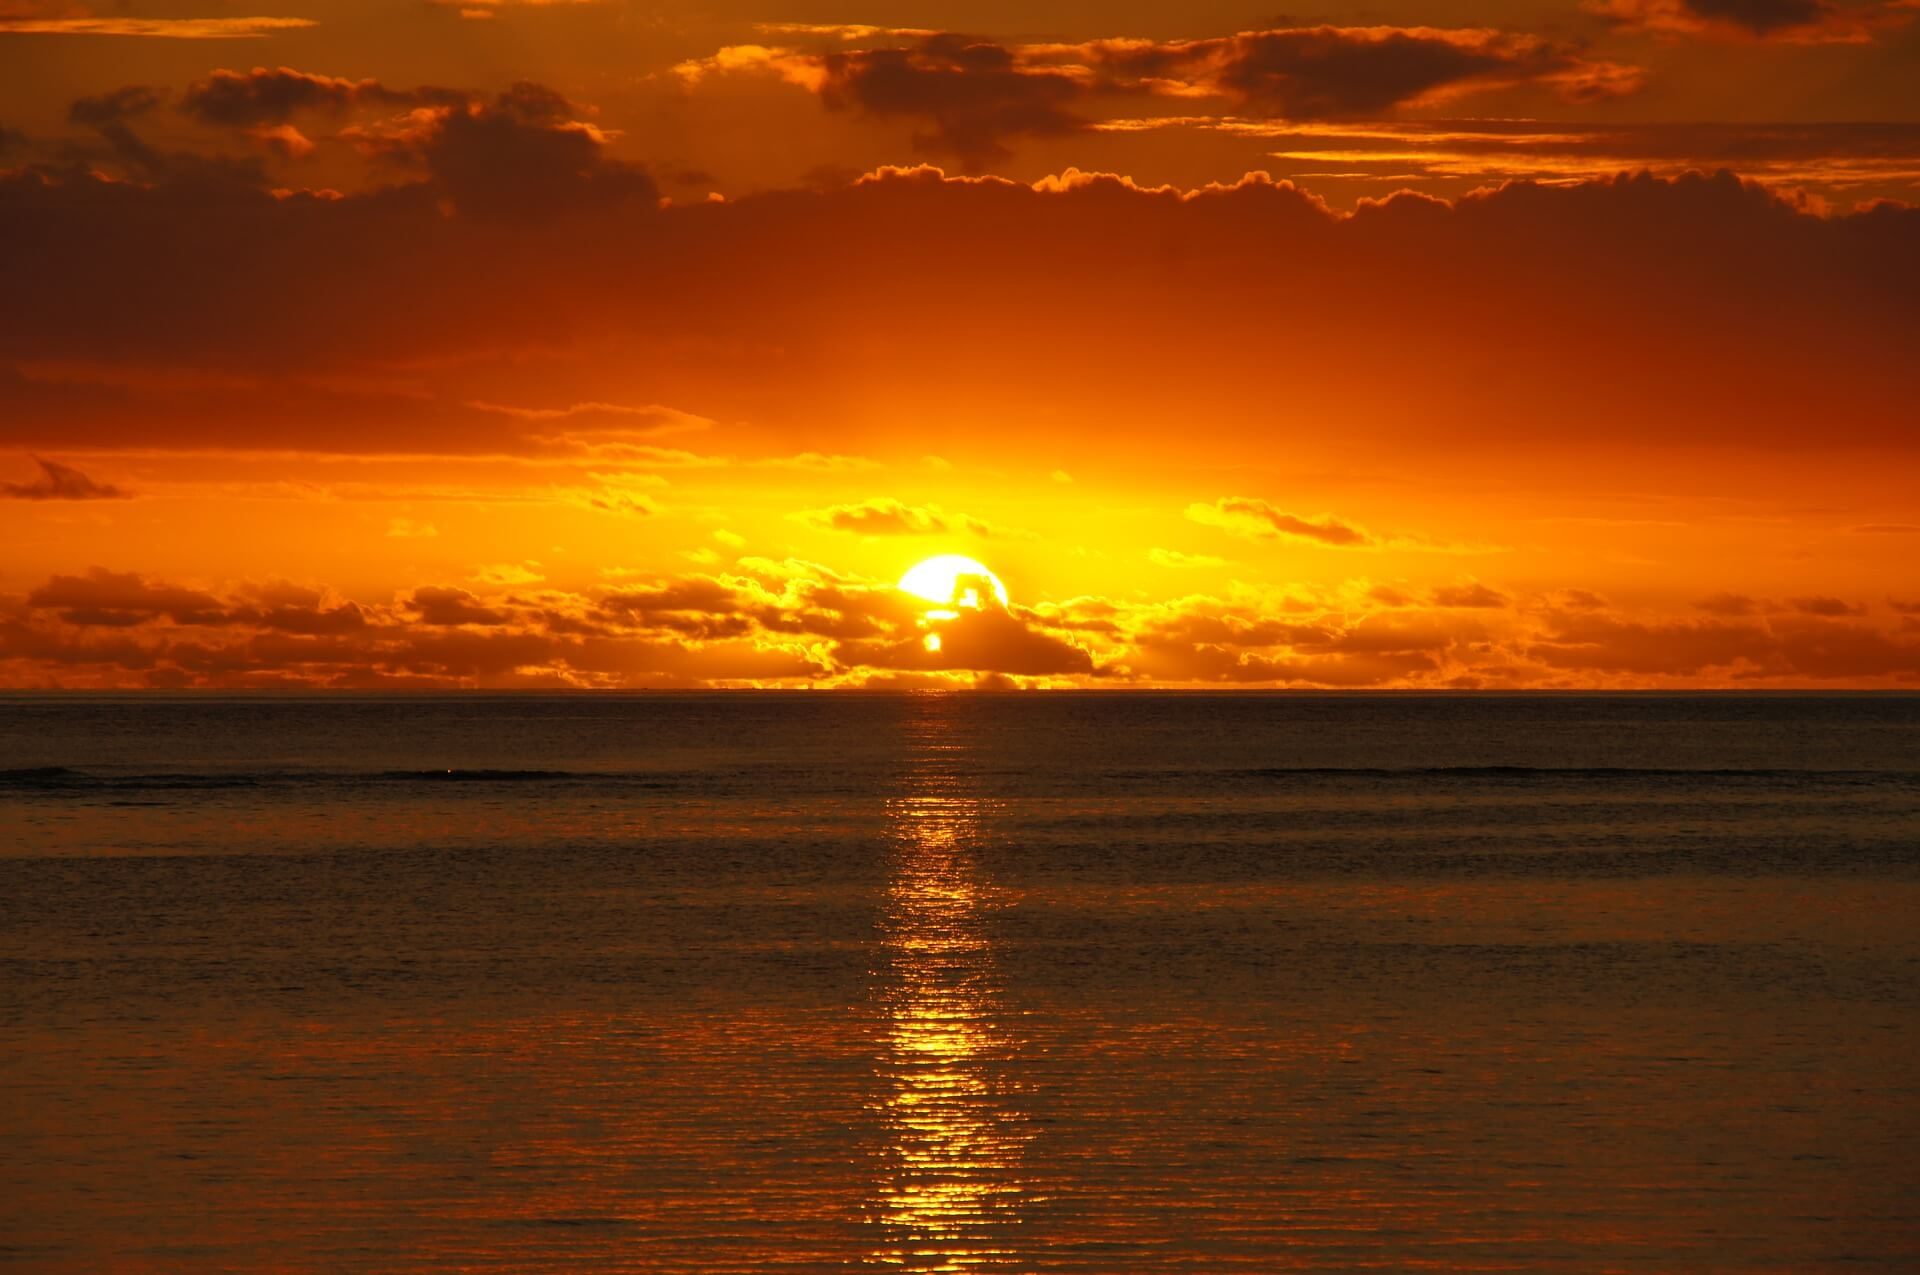 sunset-4734478_1920